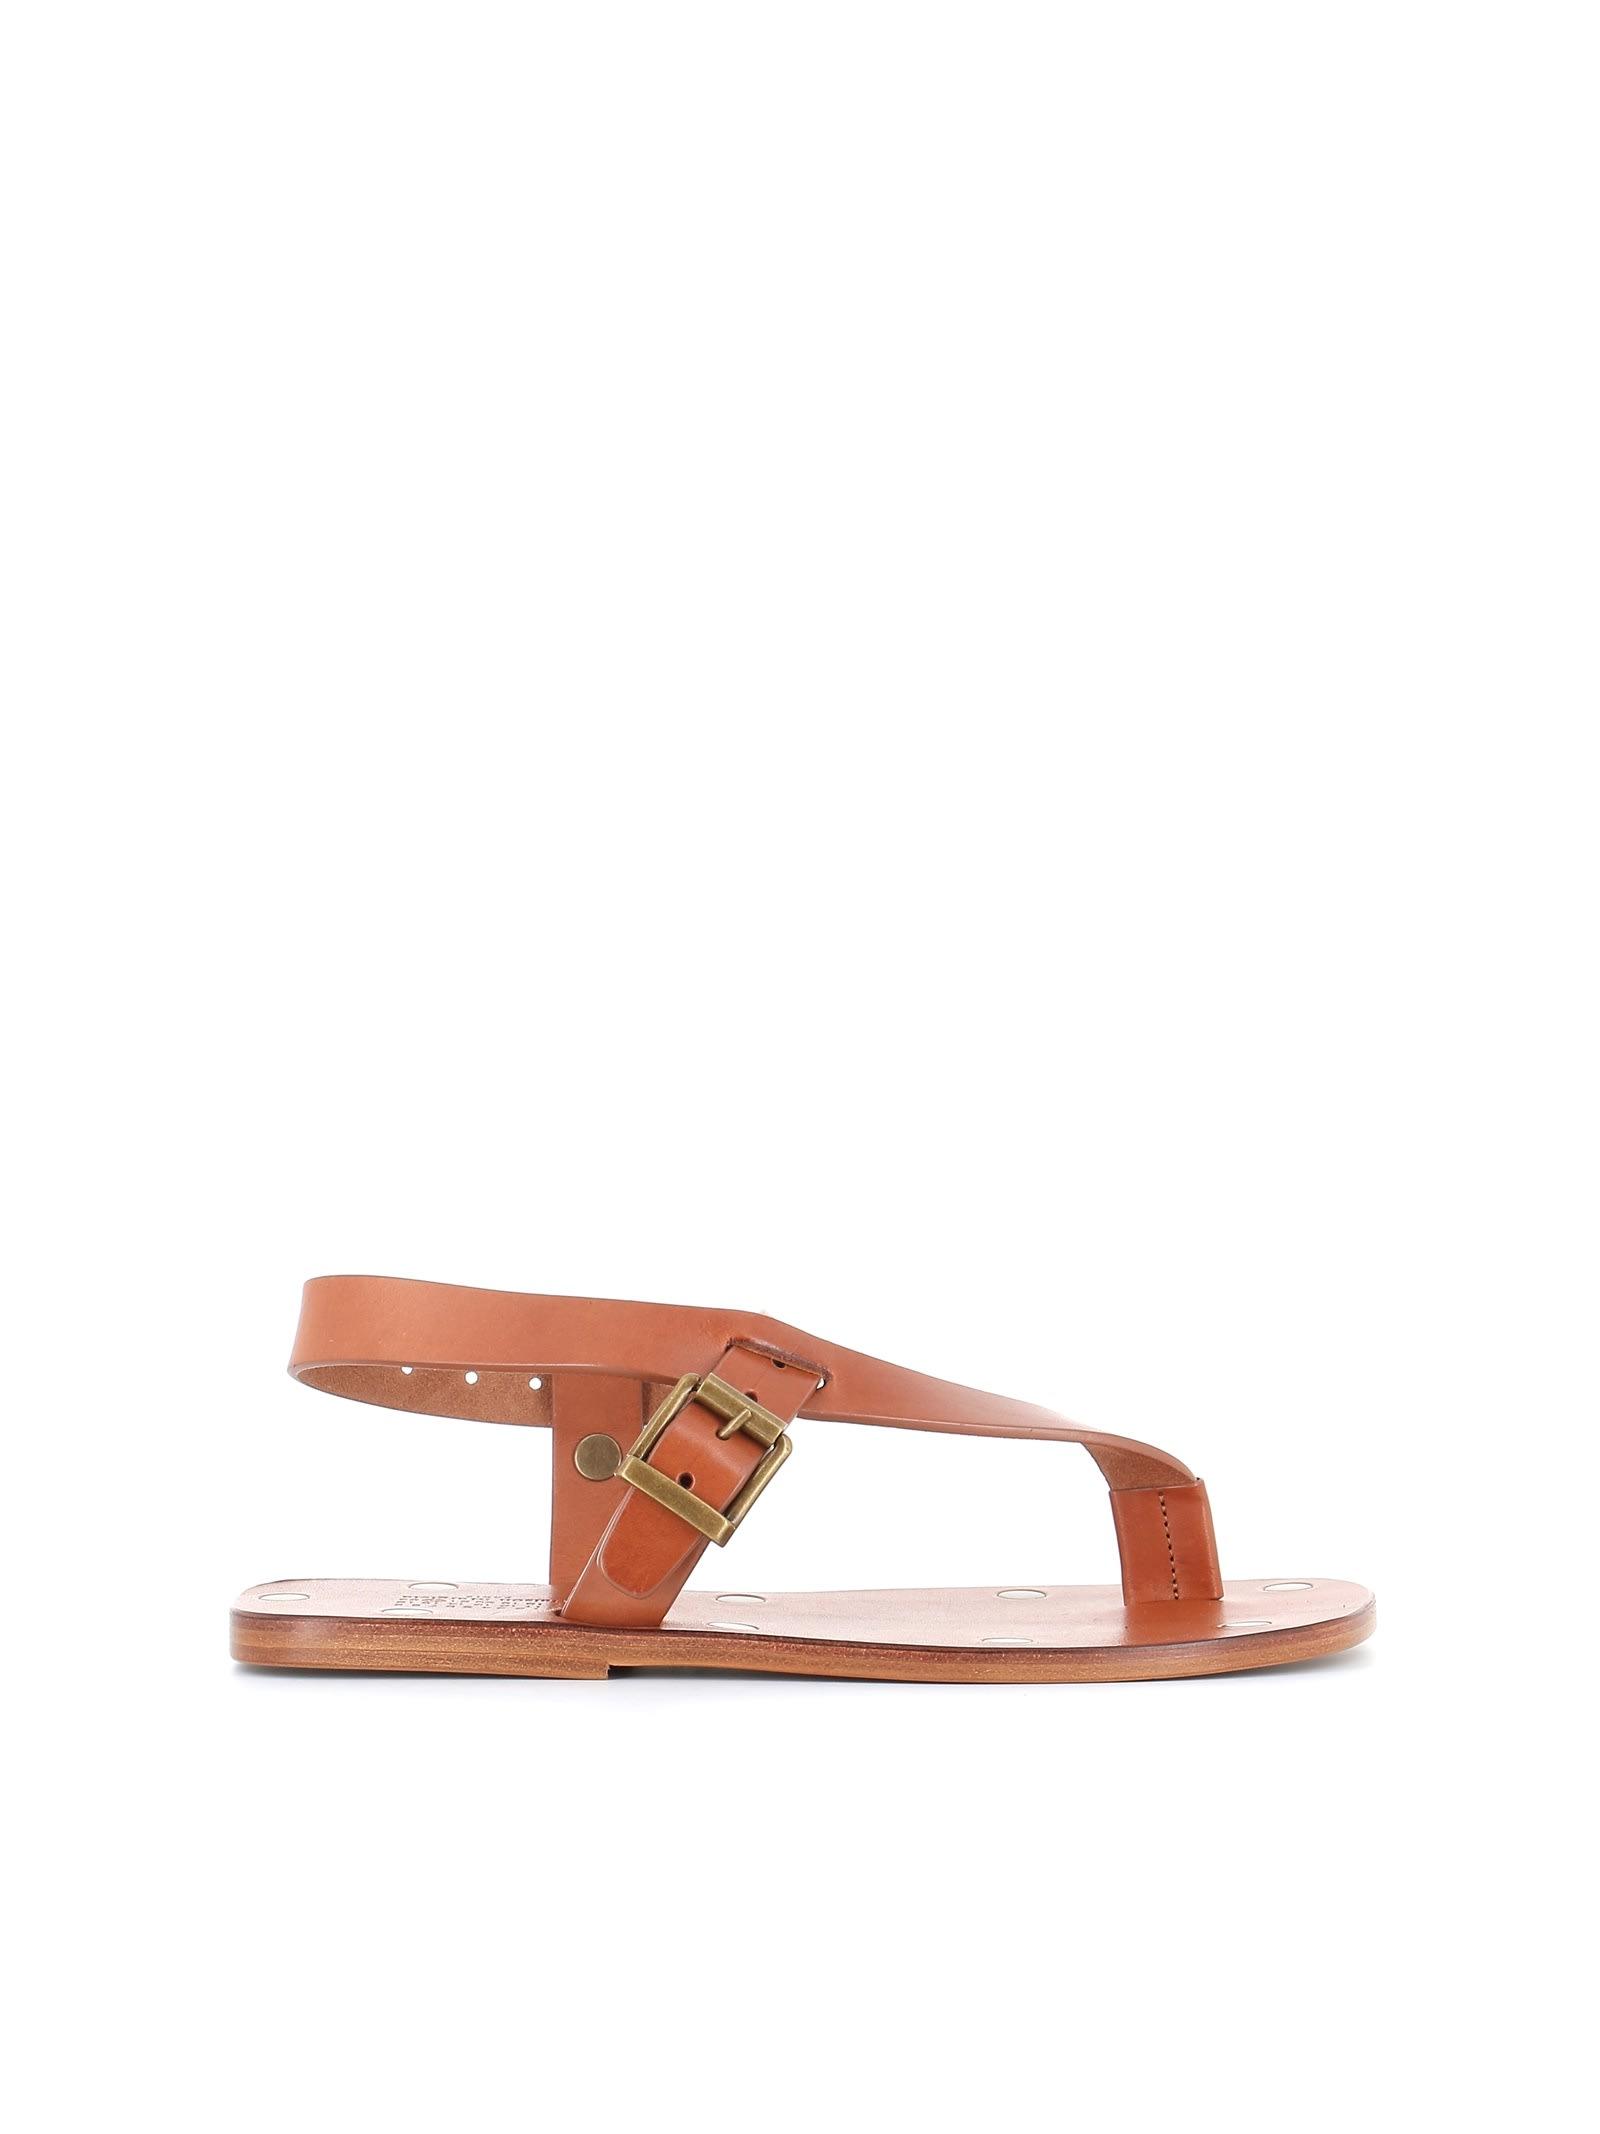 Buy Maison Margiela Flip-flop online, shop Maison Margiela shoes with free shipping